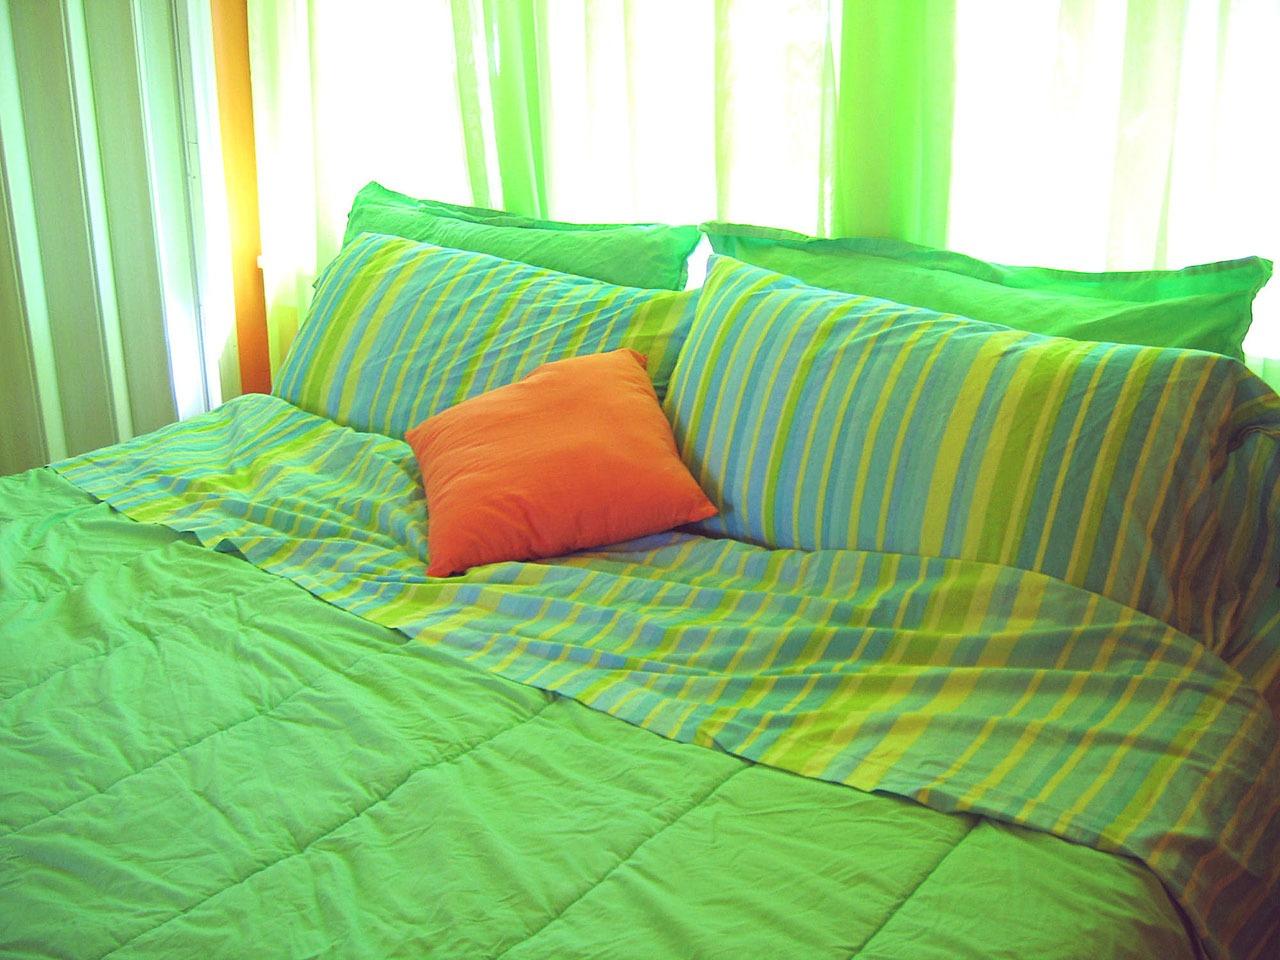 Schlafzimmer inspiration grün – midir